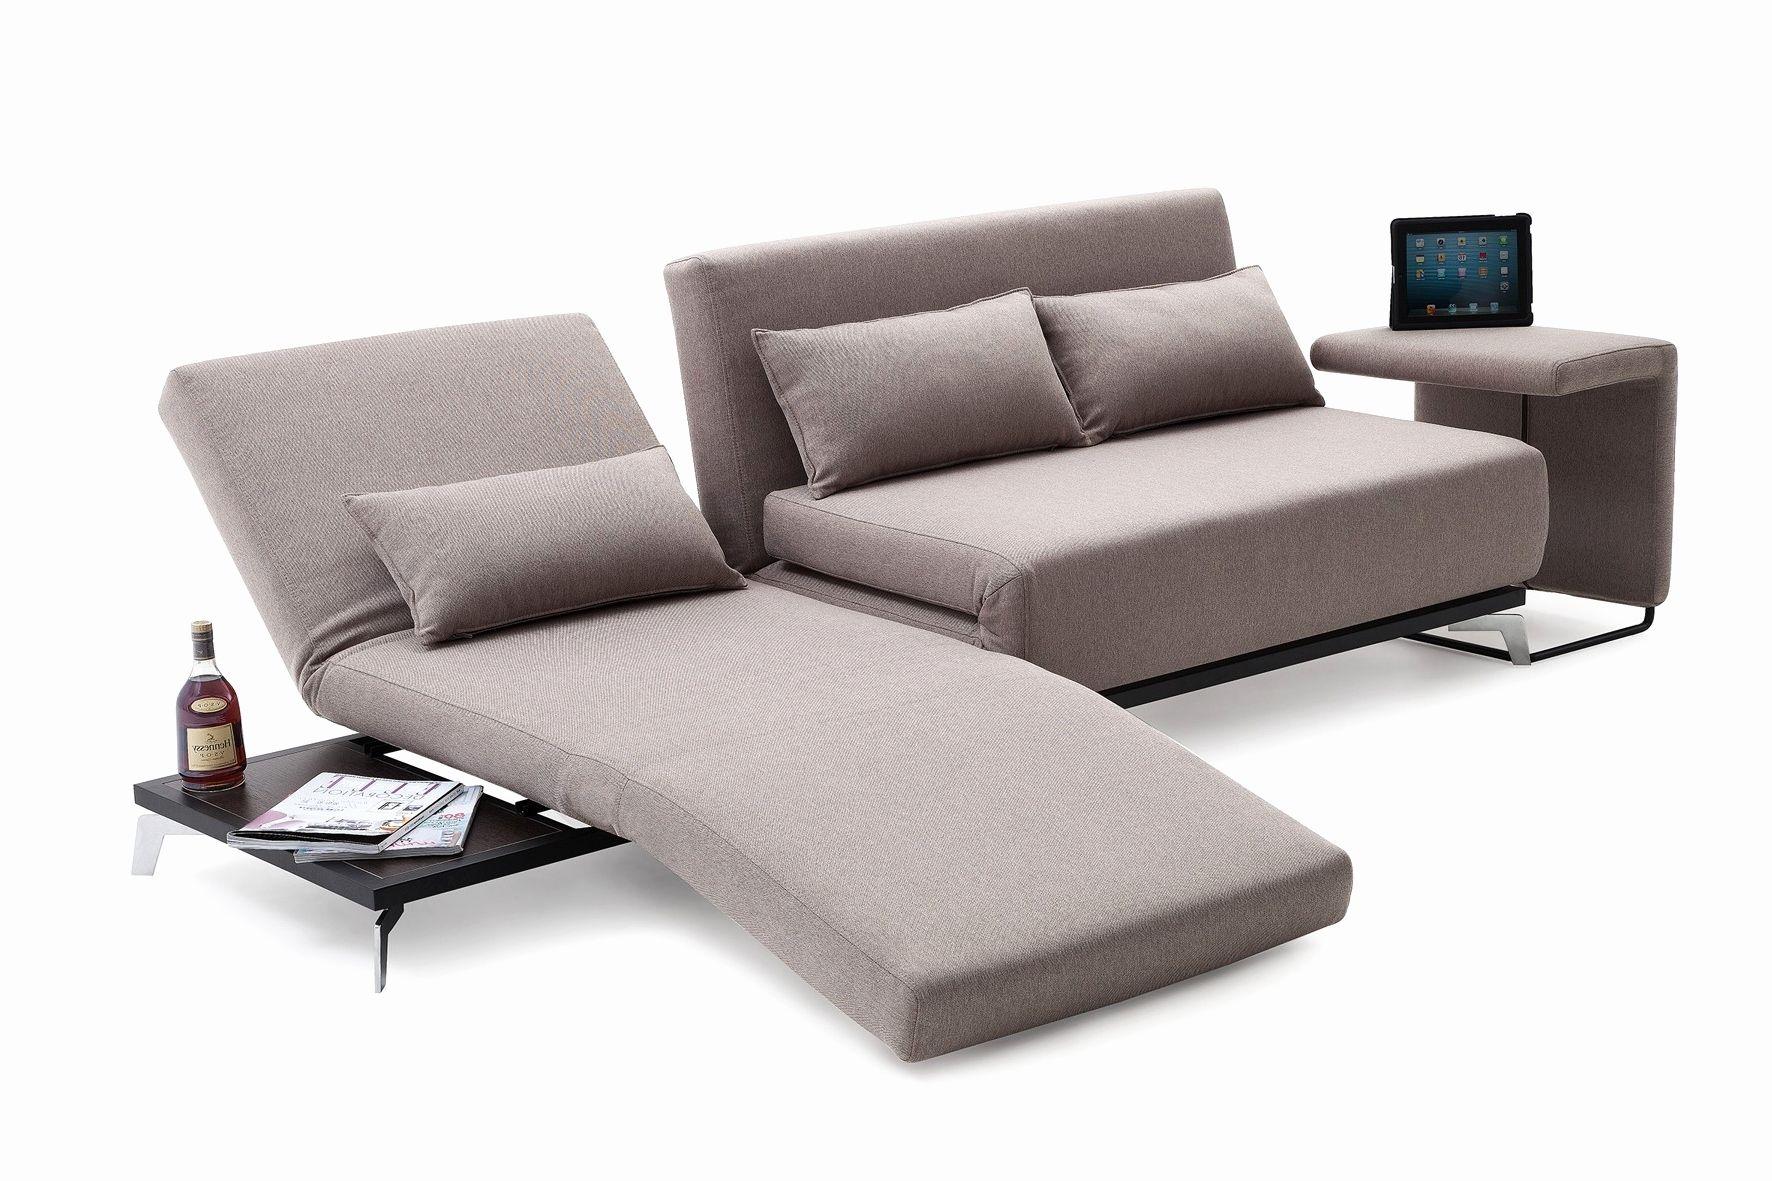 Unique modern sofa bed queen photographs best of sofa bed queen size